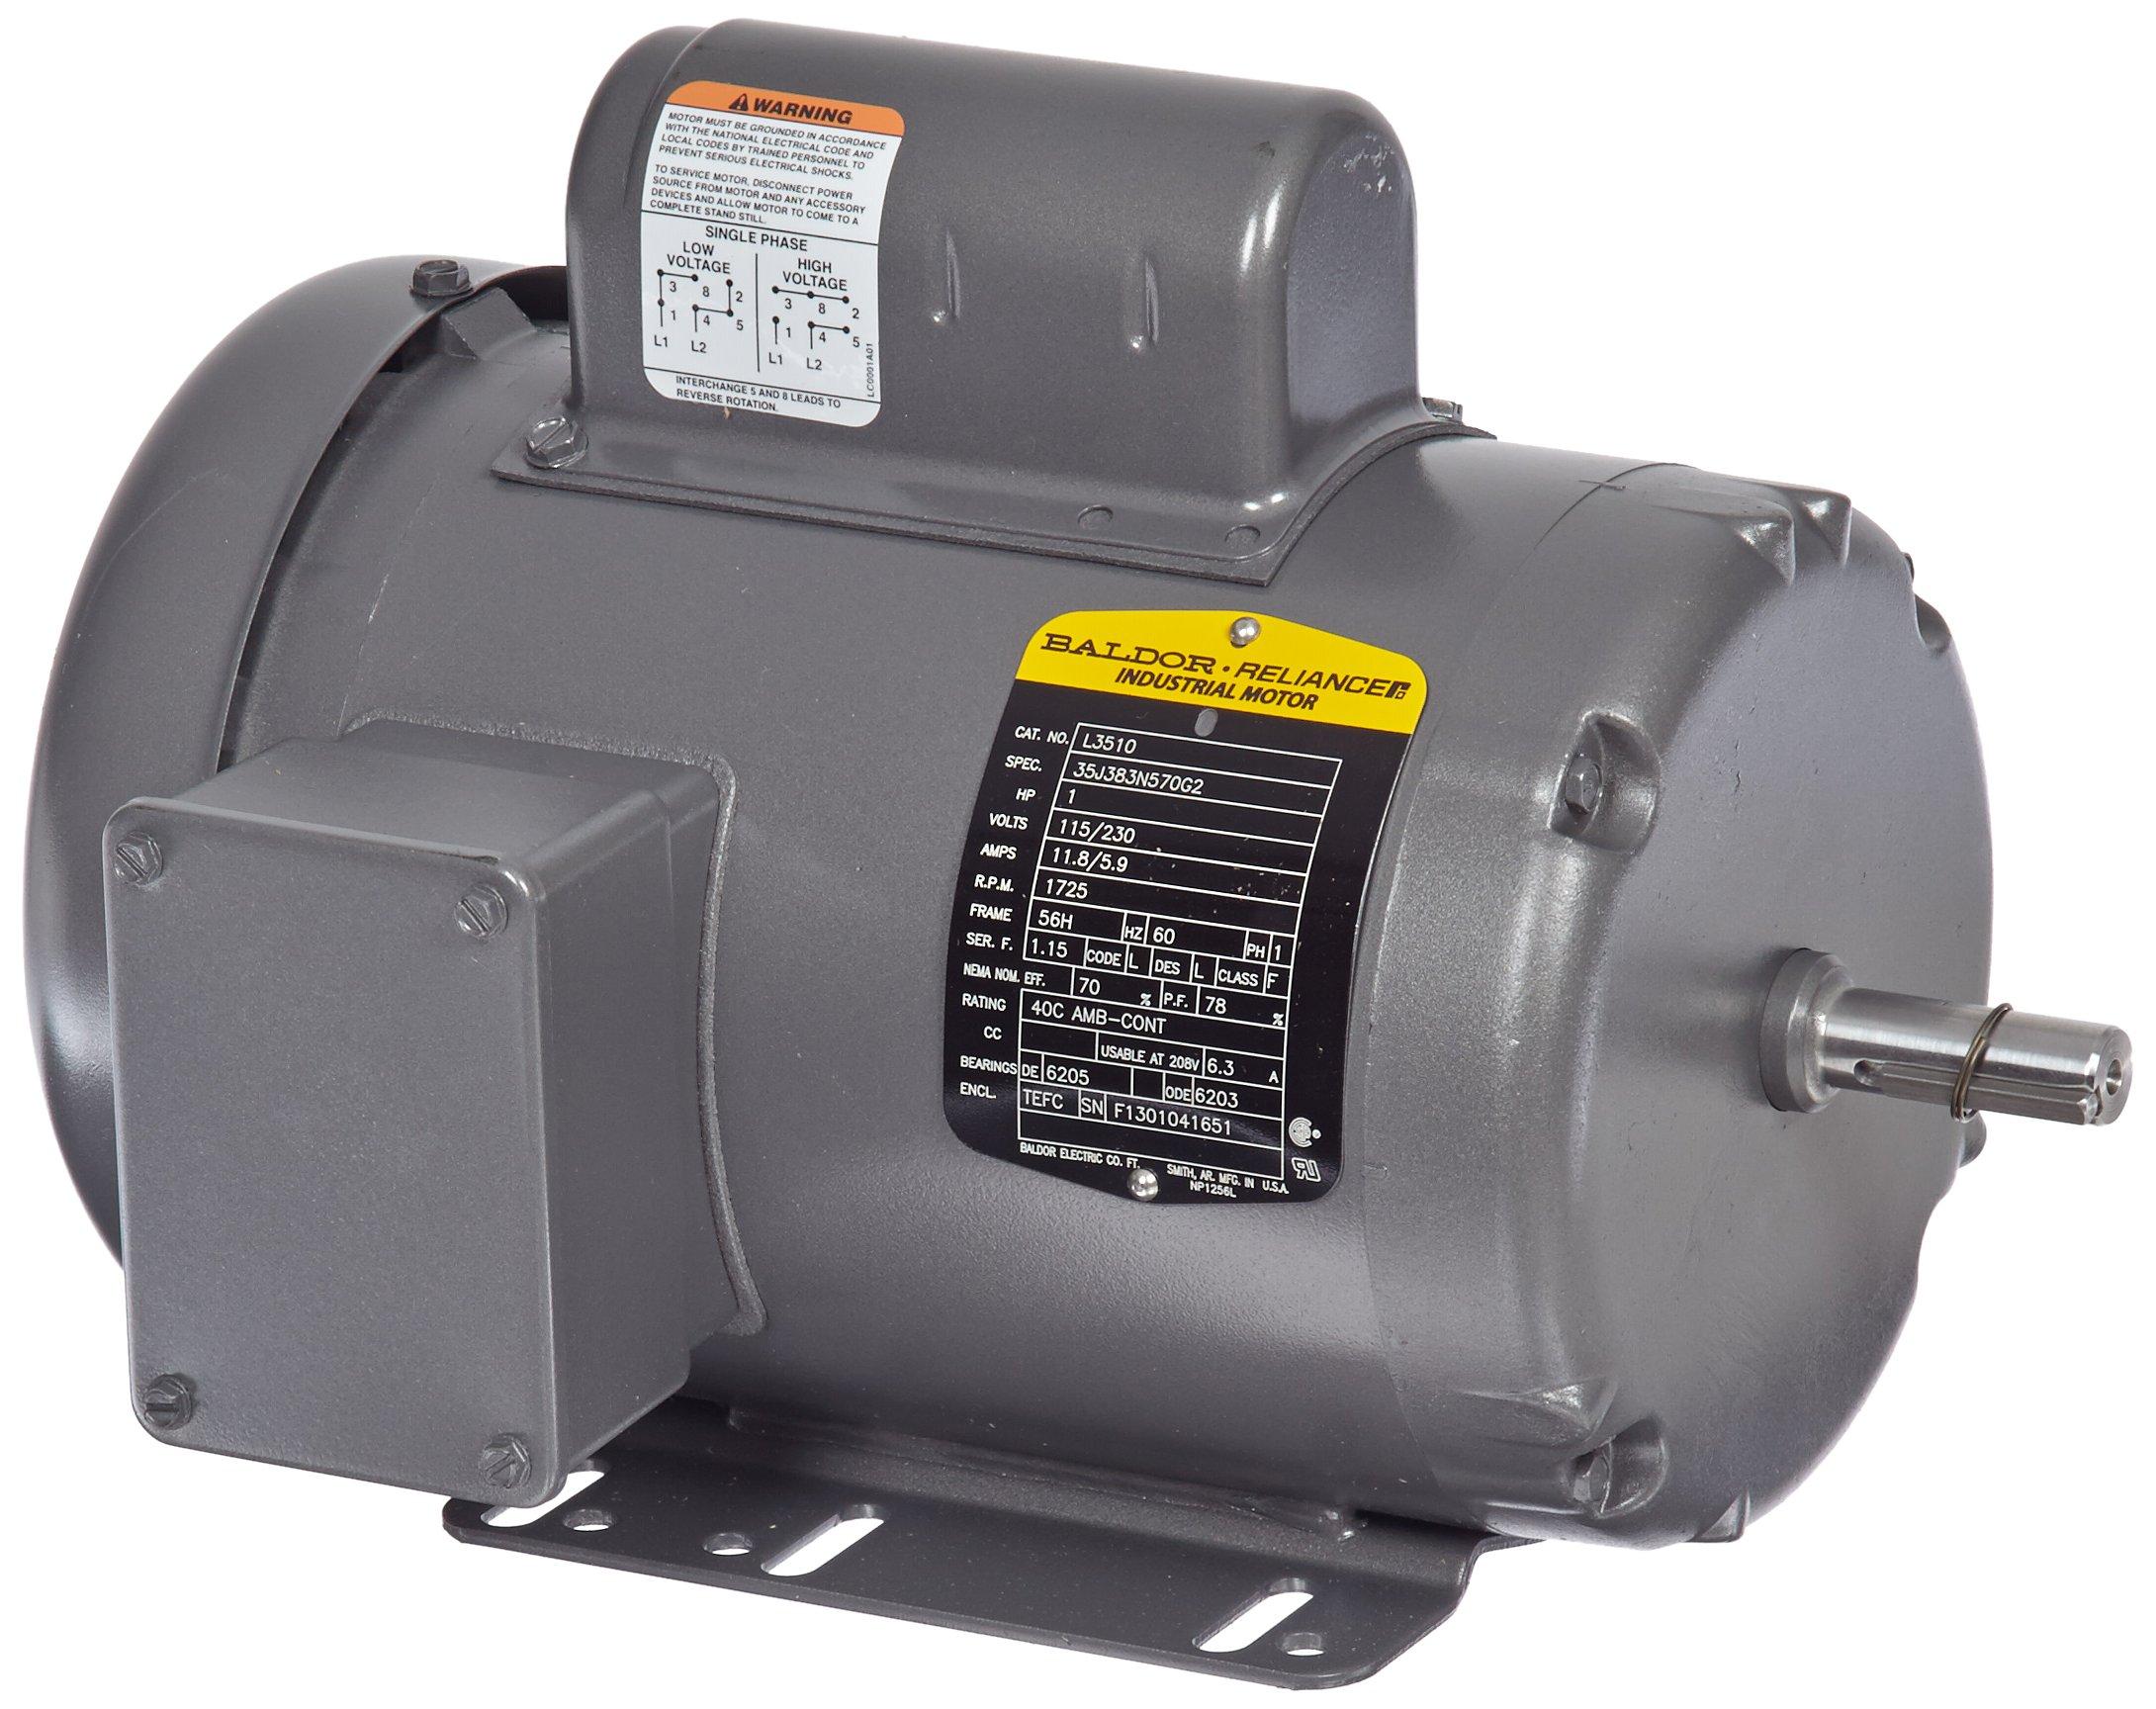 Baldor L3510 General Purpose AC Motor, Single Phase, 56H Frame, TEFC Enclosure, 1Hp Output, 1725rpm, 60Hz, 115/230V Voltage